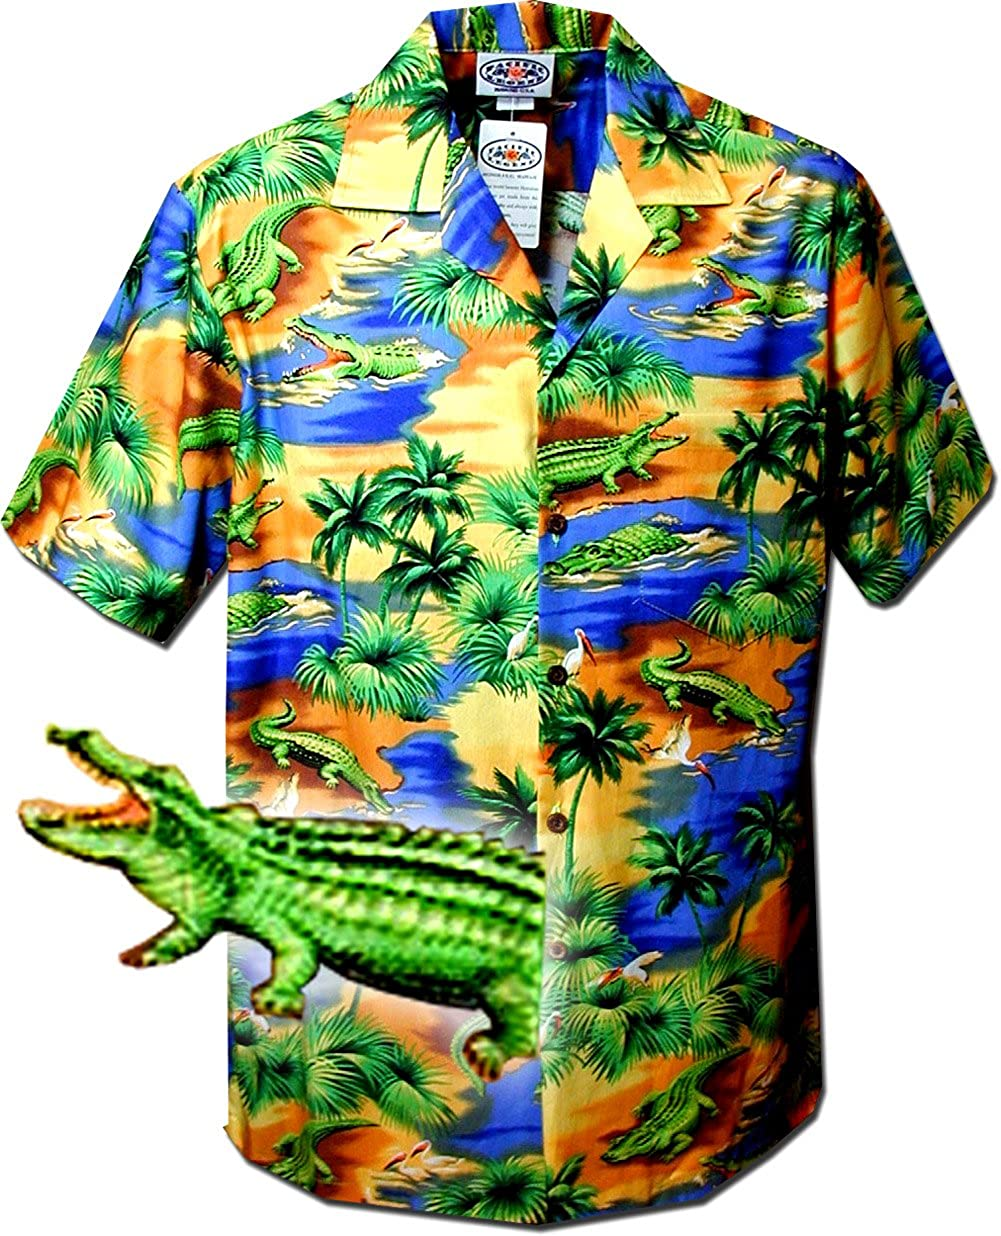 Pacific Legend Tropical Shirts Alligators